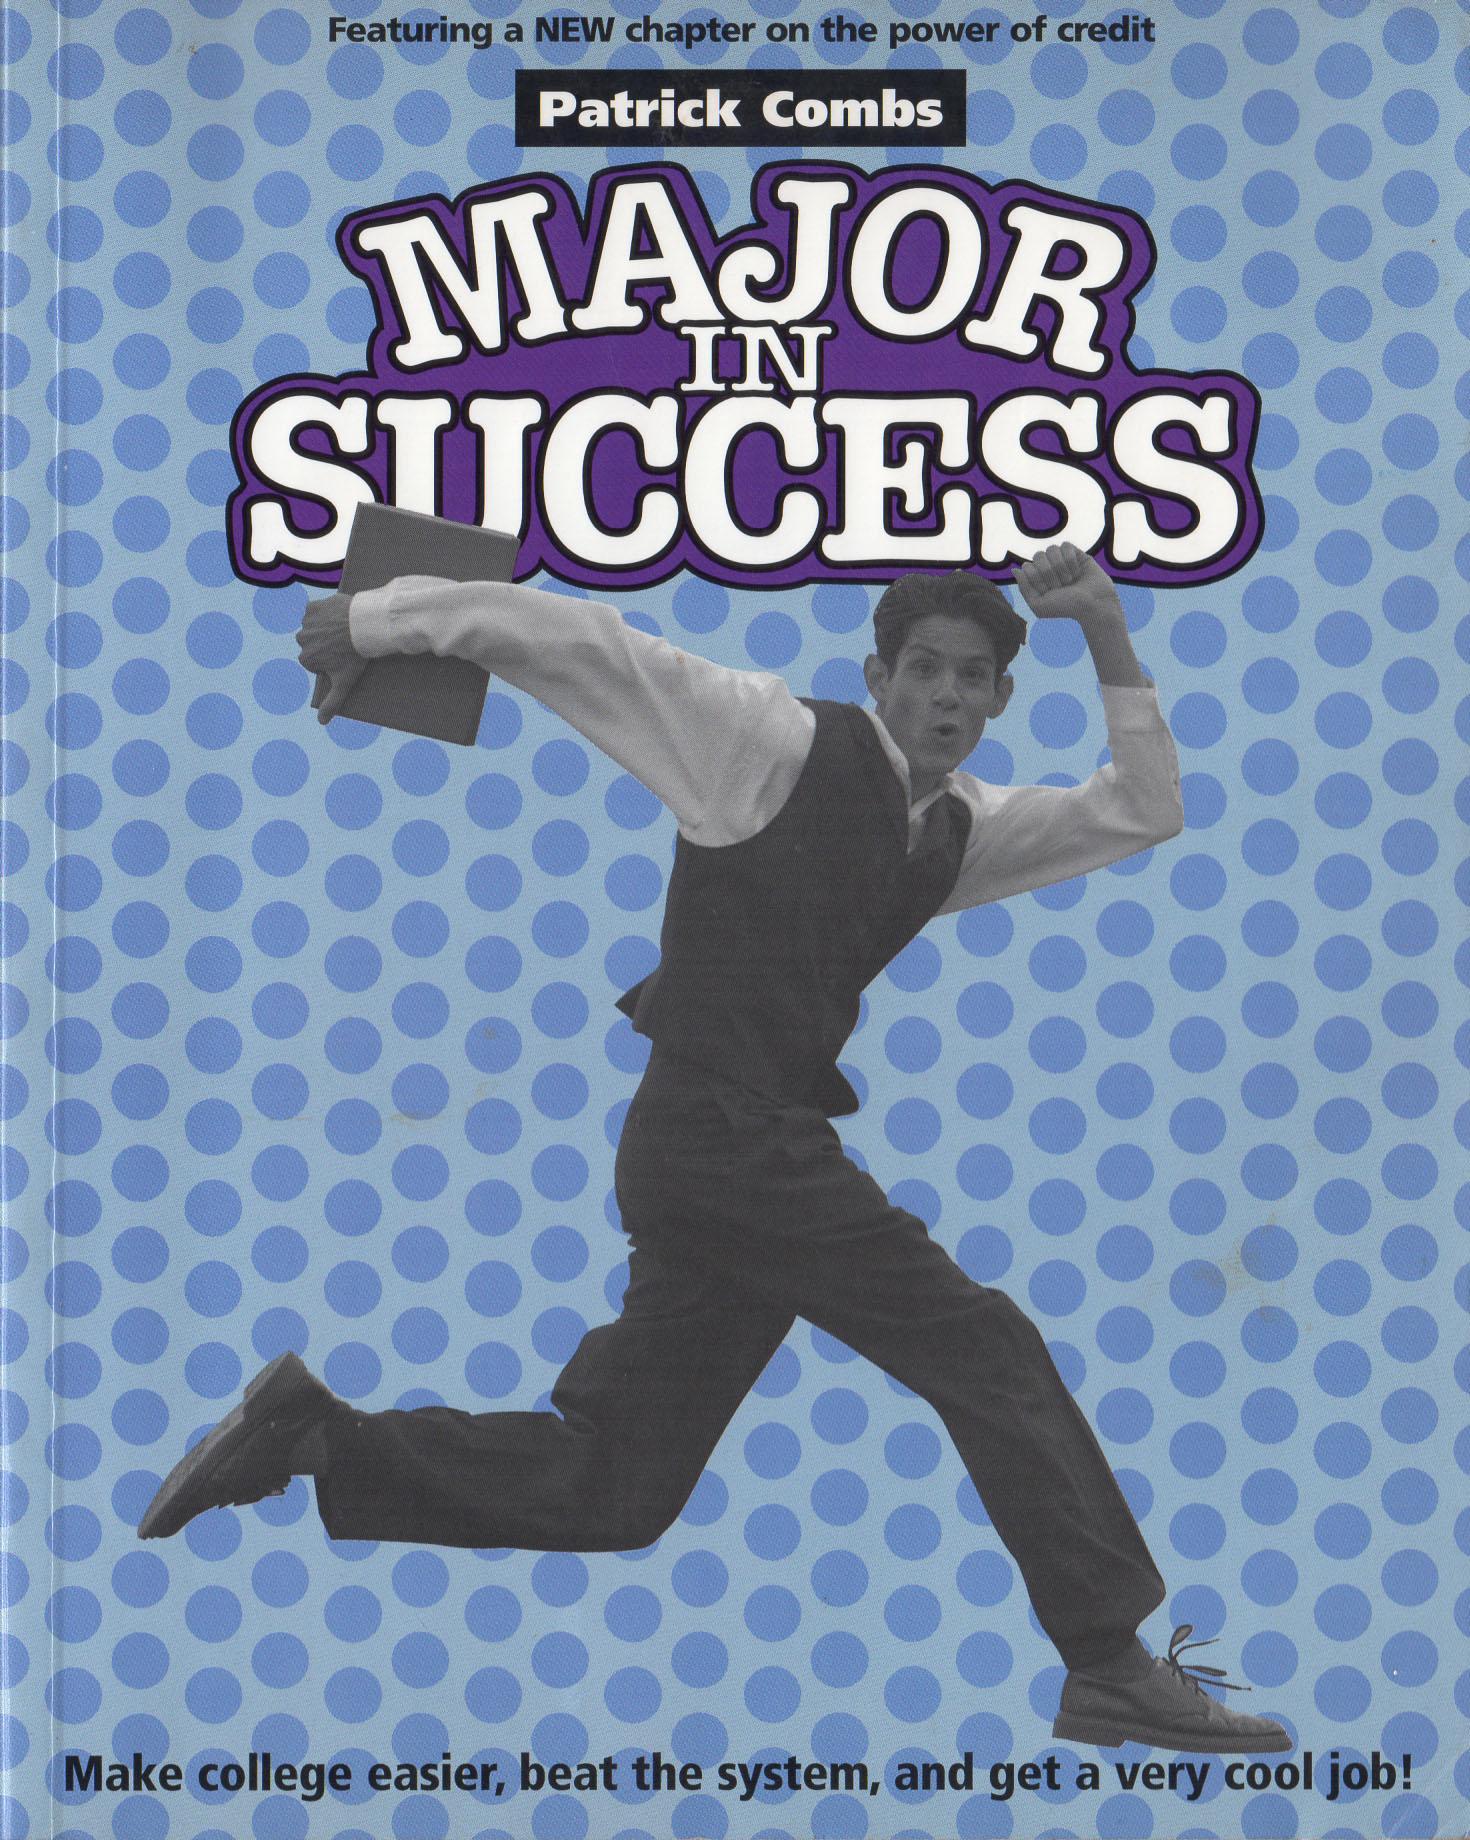 Good Job Patrick: MAJOR IN SUCCESS: Make College Easier, Get Job